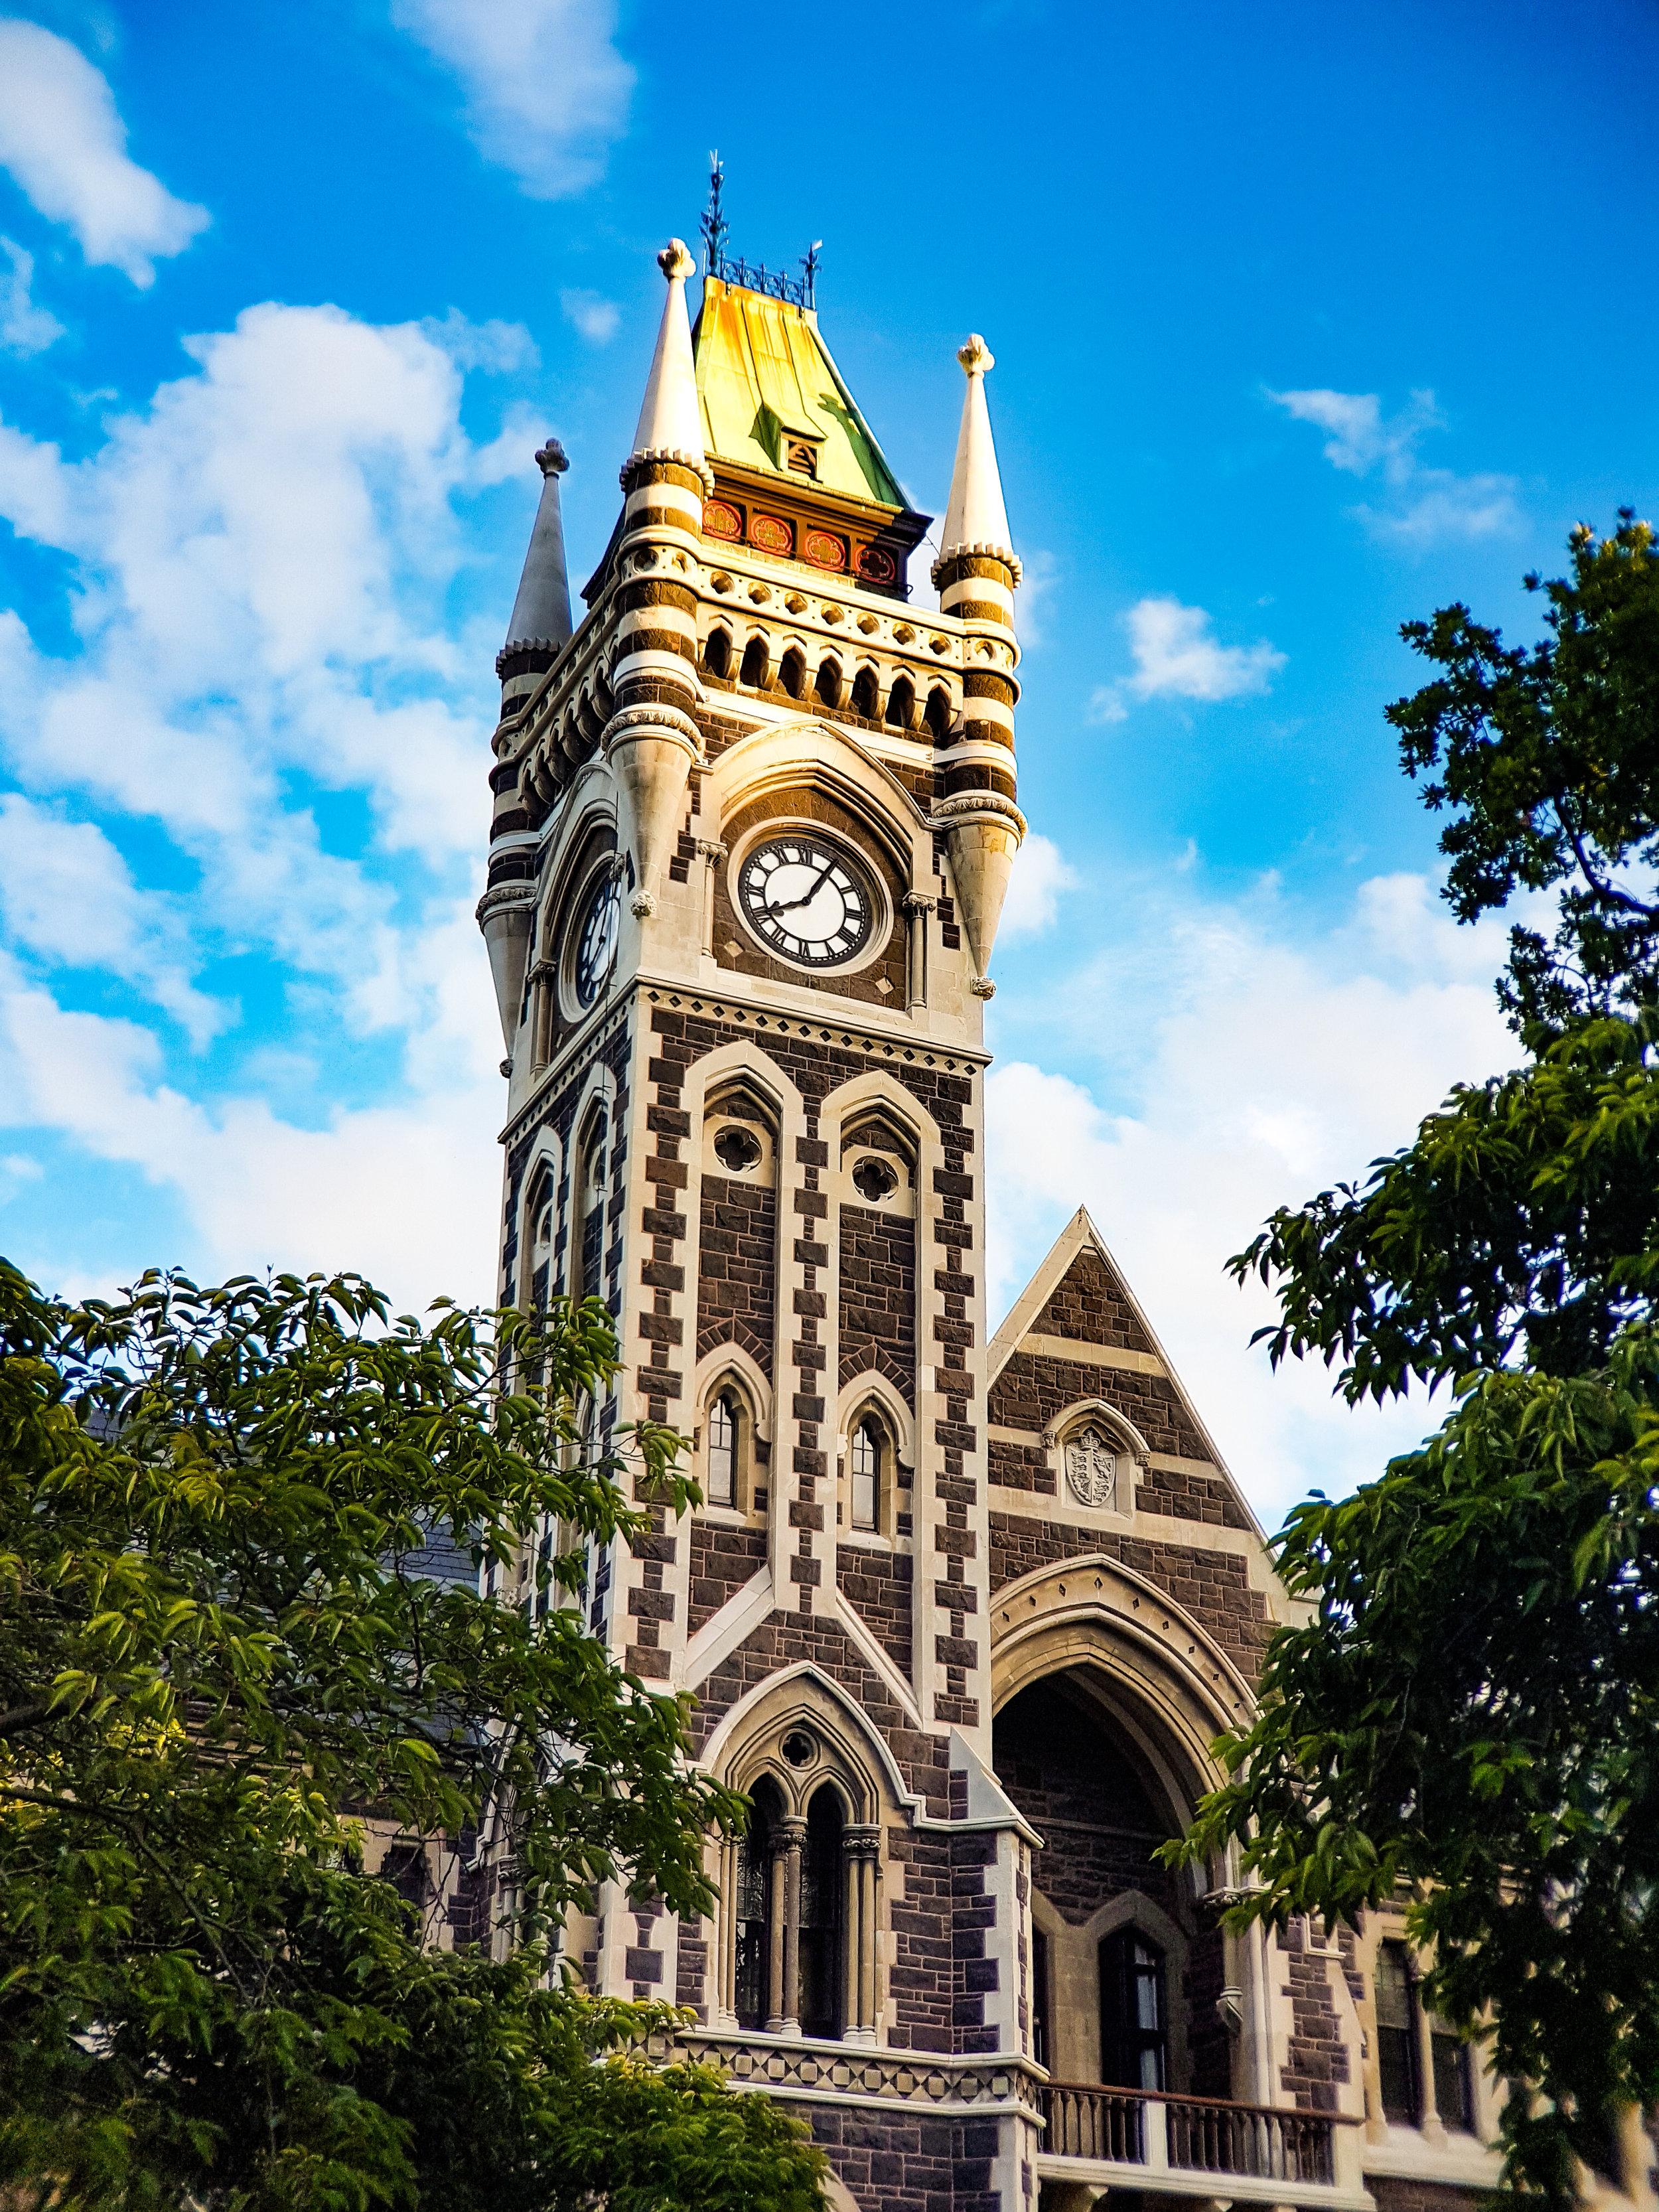 Otago University clocktower